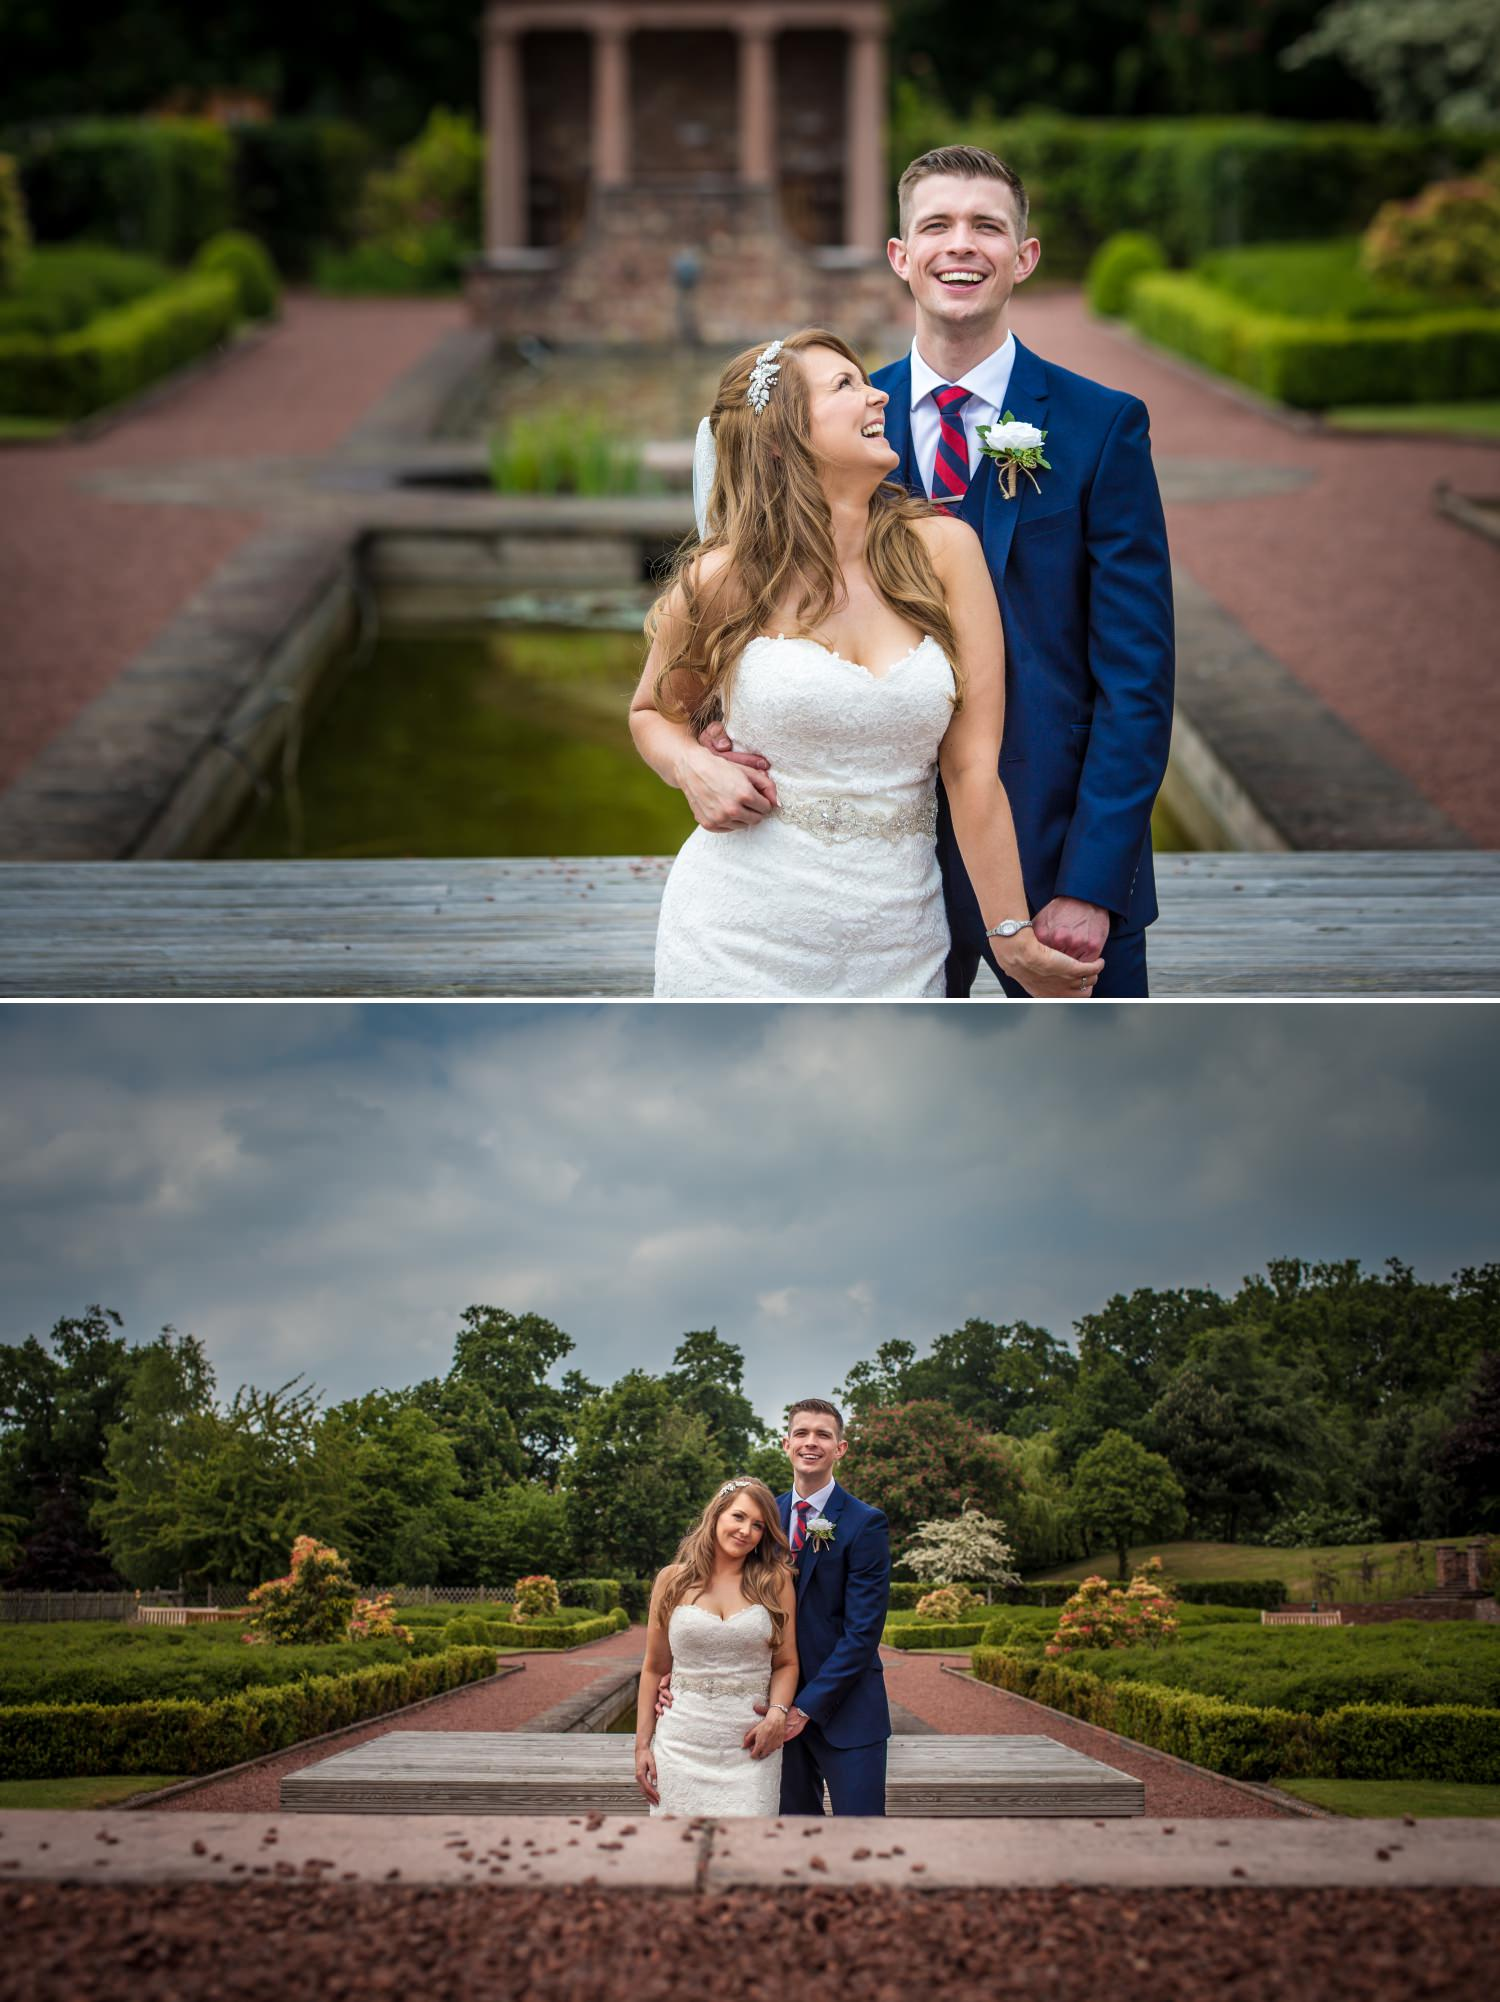 portrait Wedding Photography at Carden Park